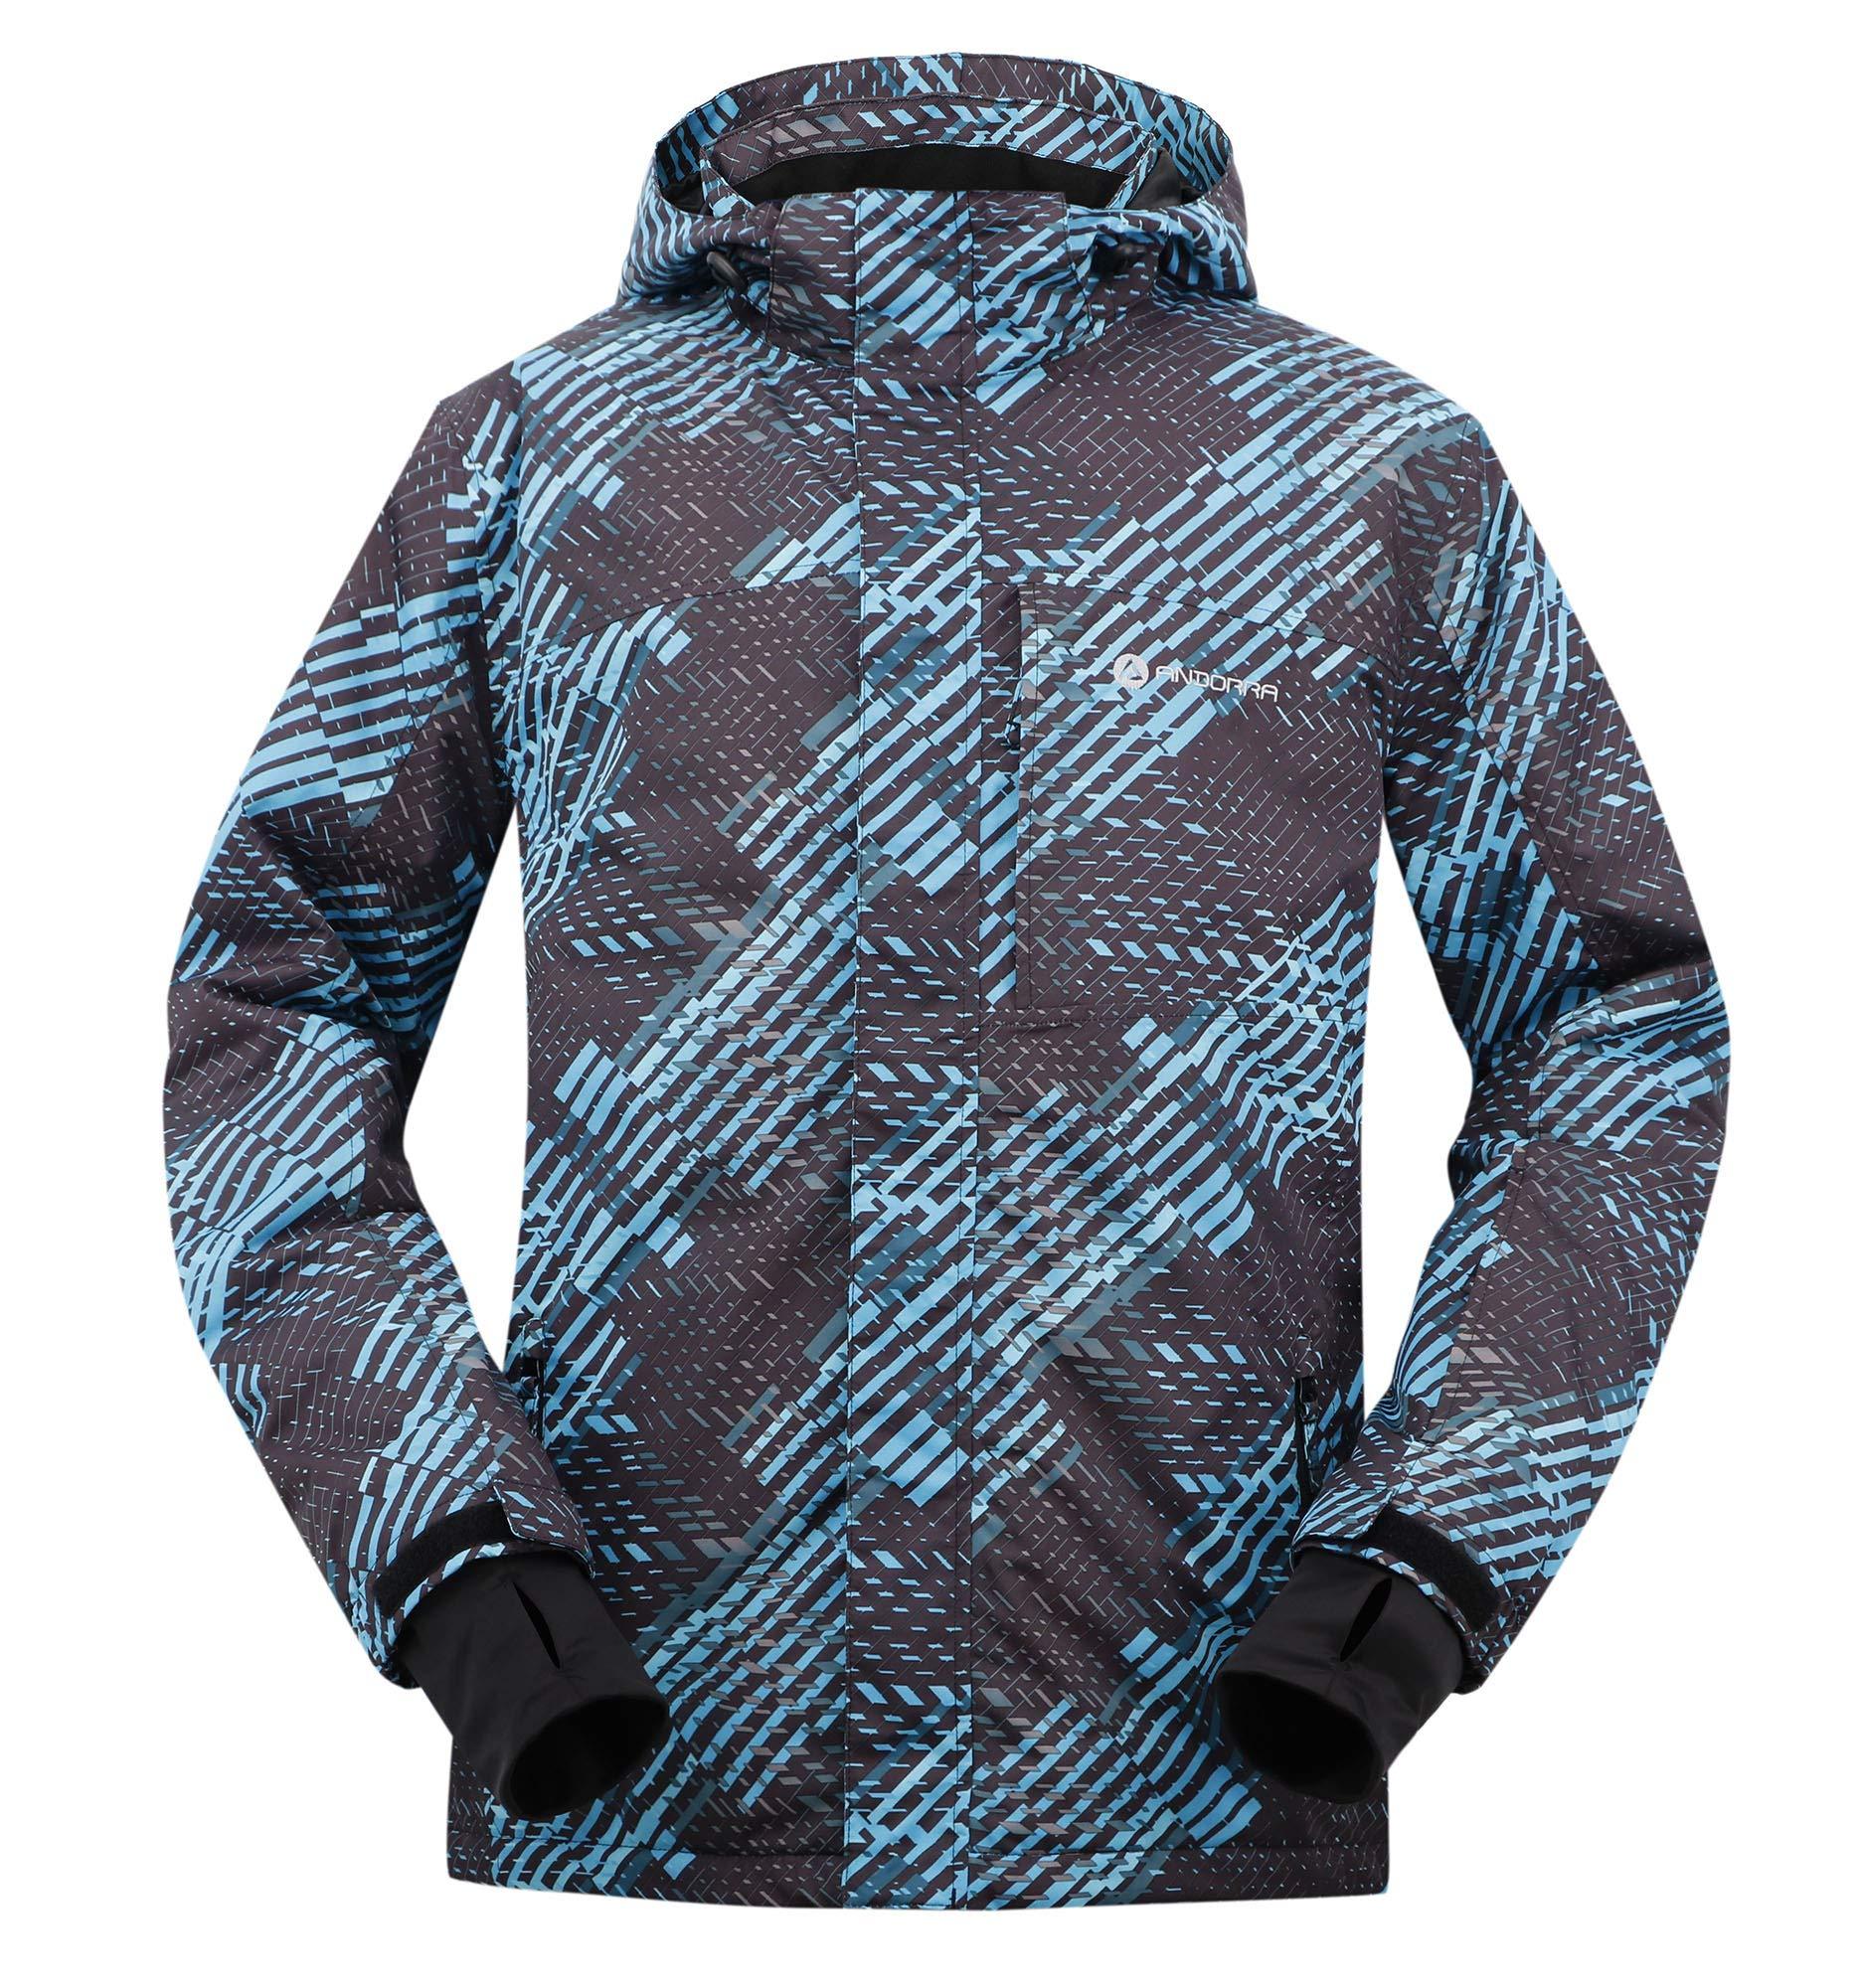 Andorra Men's Performance Insulated Ski Jacket with Zip-Off Hood,Binary Matrix,L by Andorra